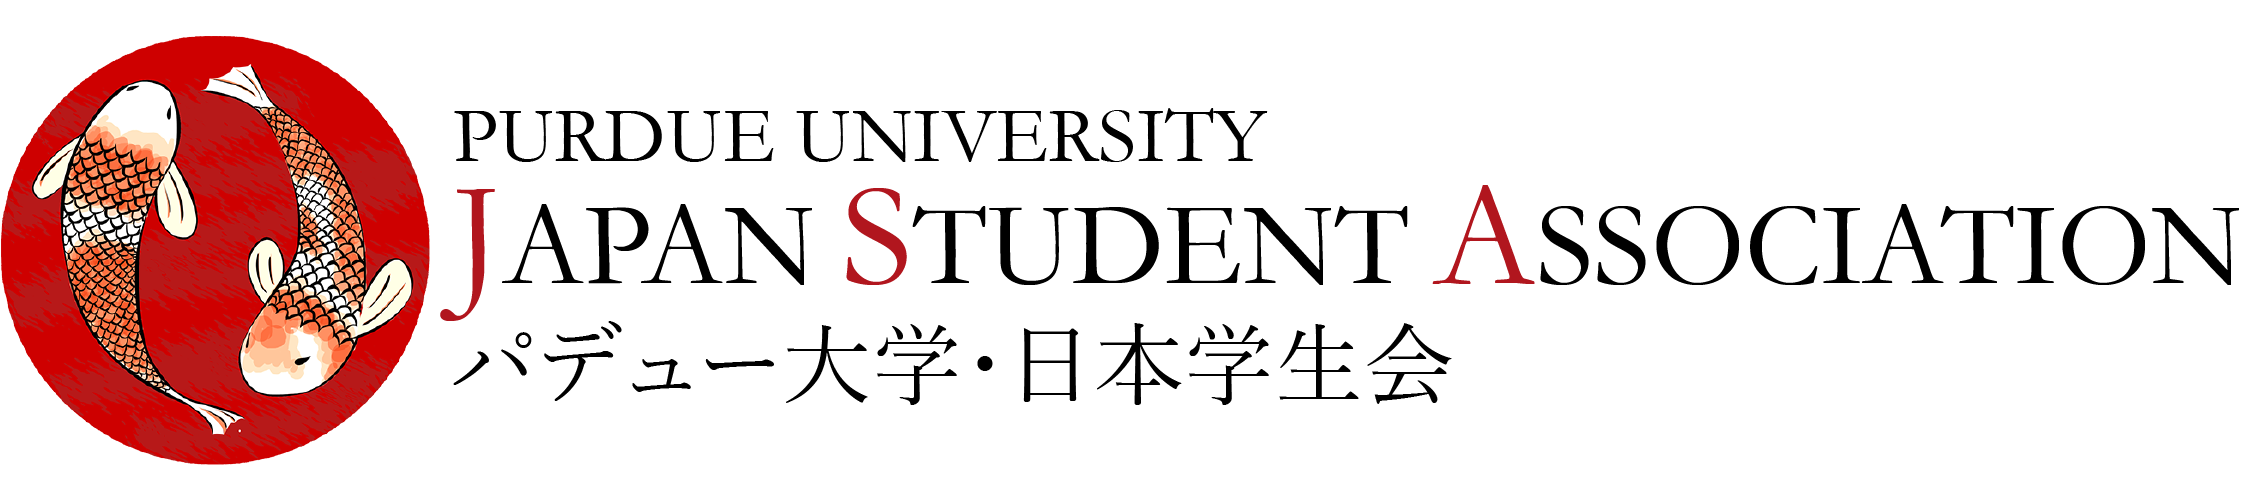 Purdue JSA | パデュー大学日本学生会 | 日本の文化や日本人との係りを深めよう